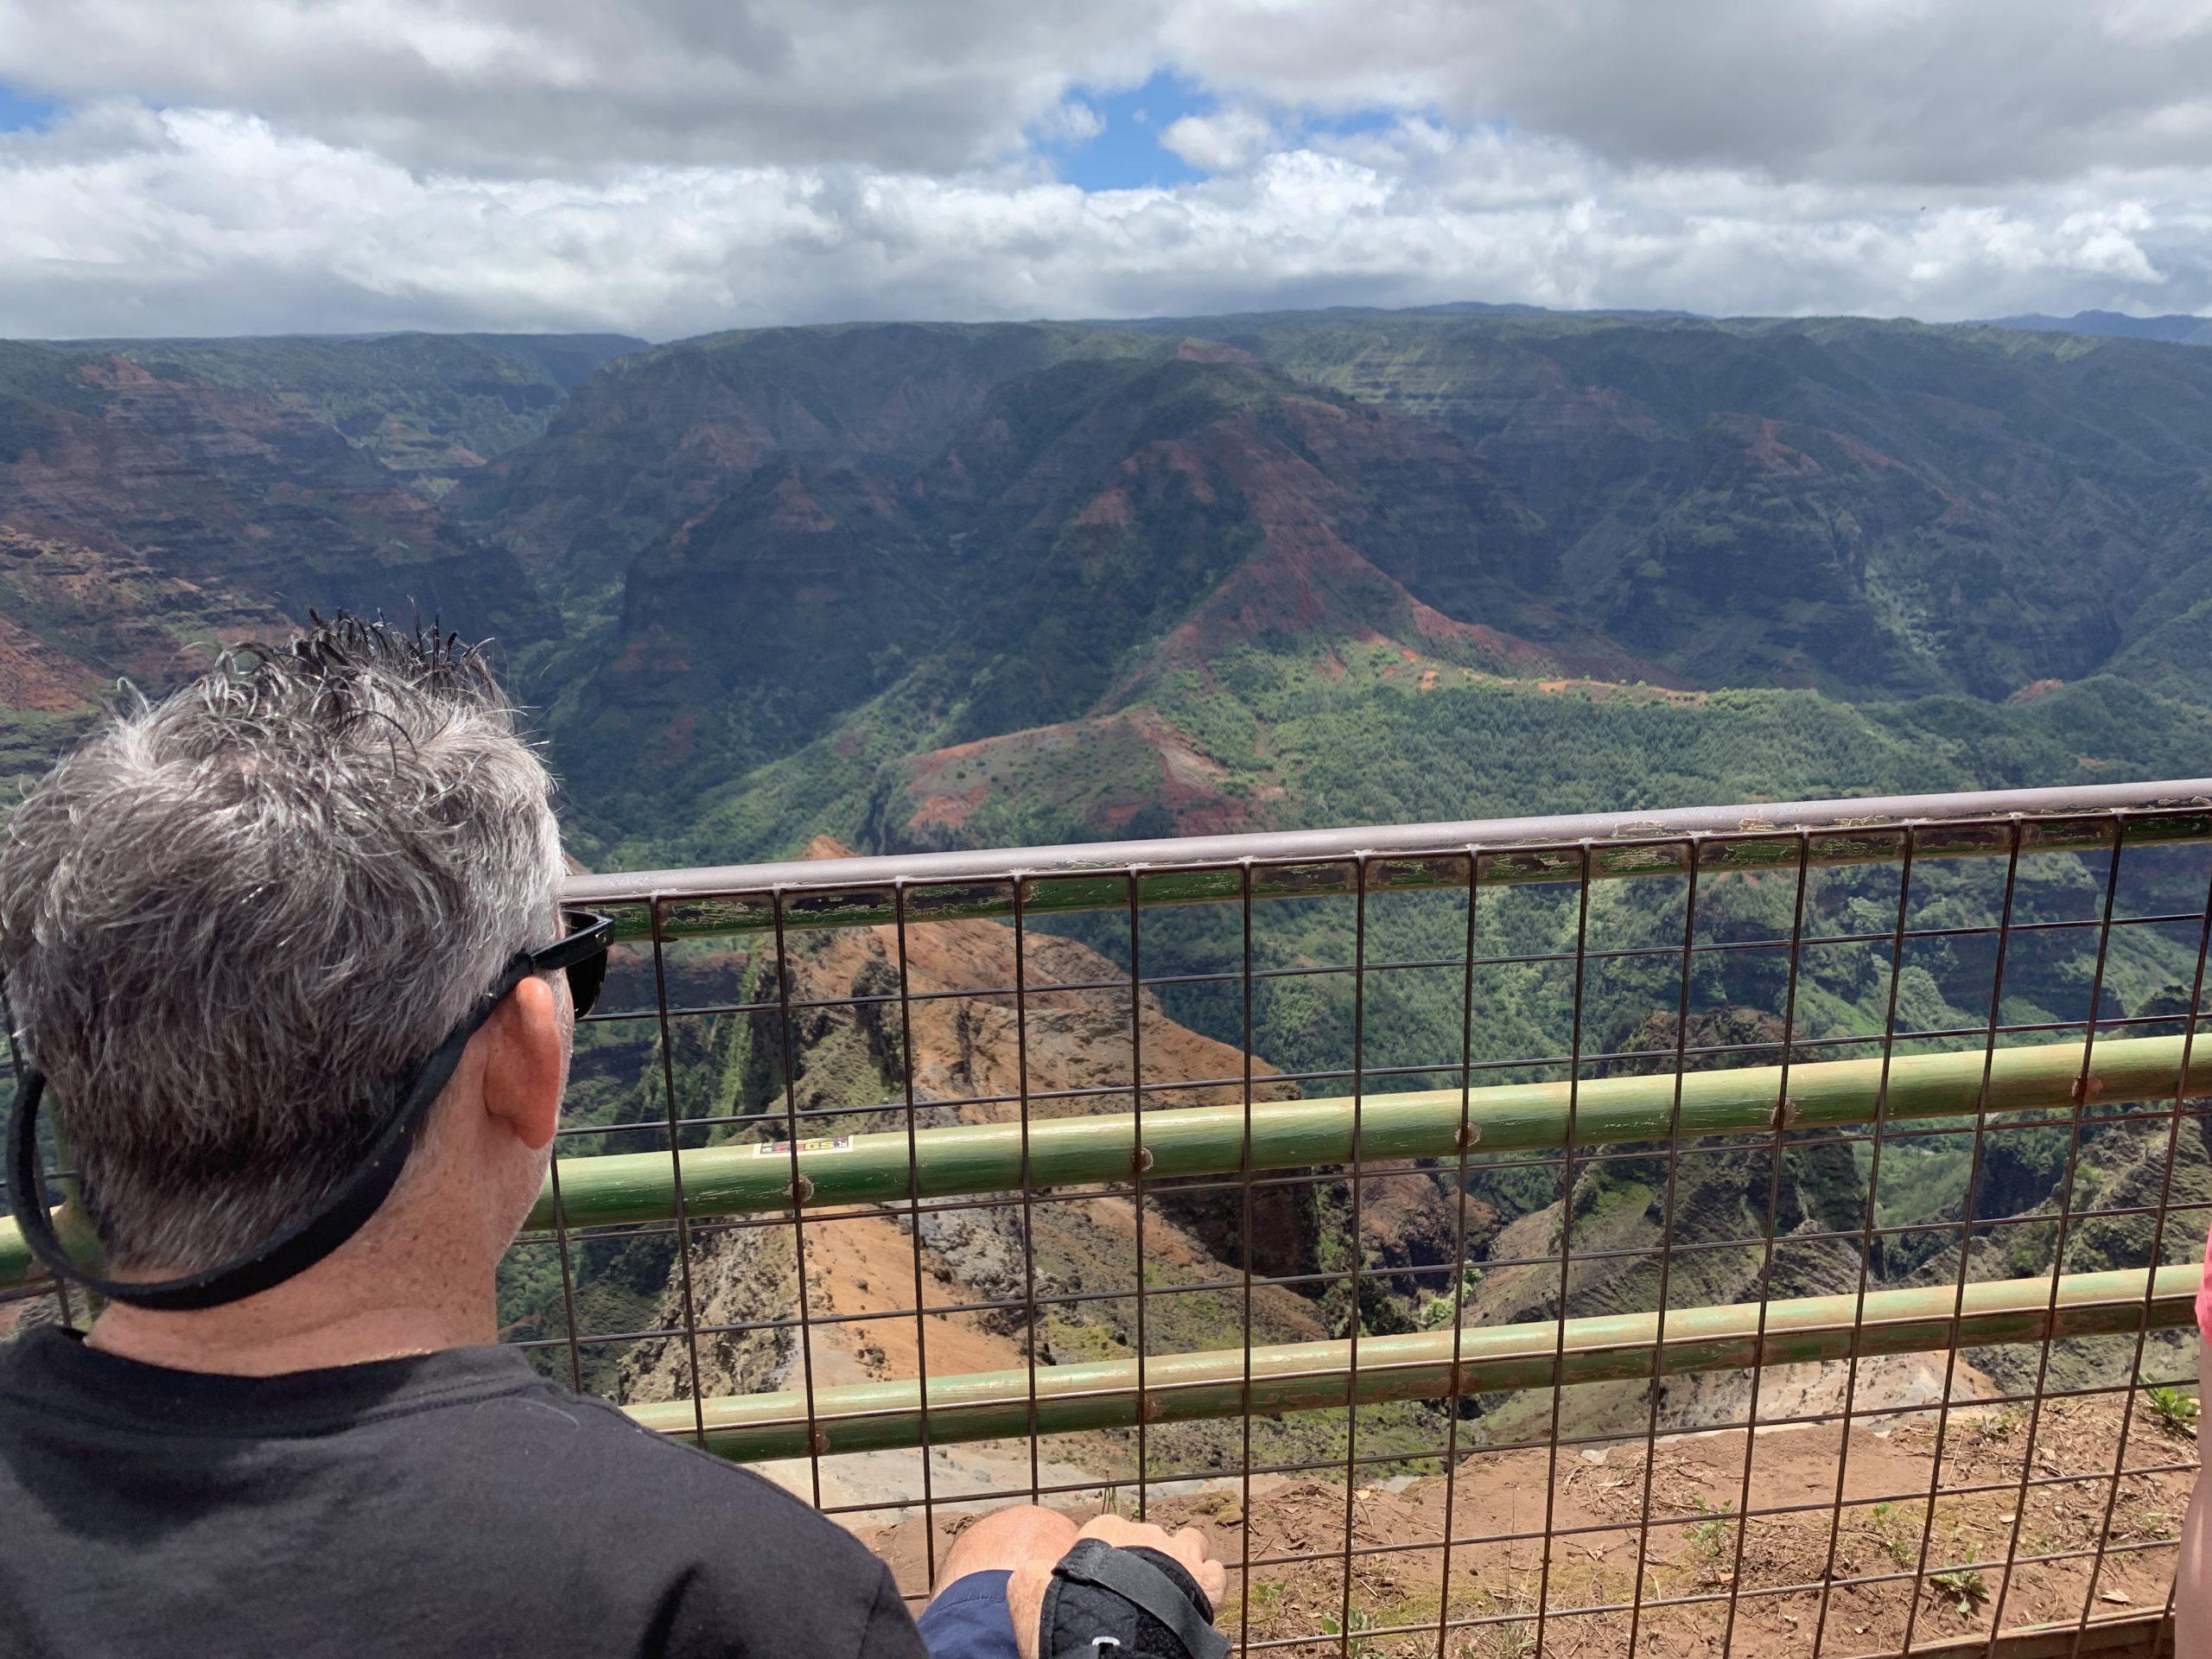 Hot Tubbin' in Hawaii